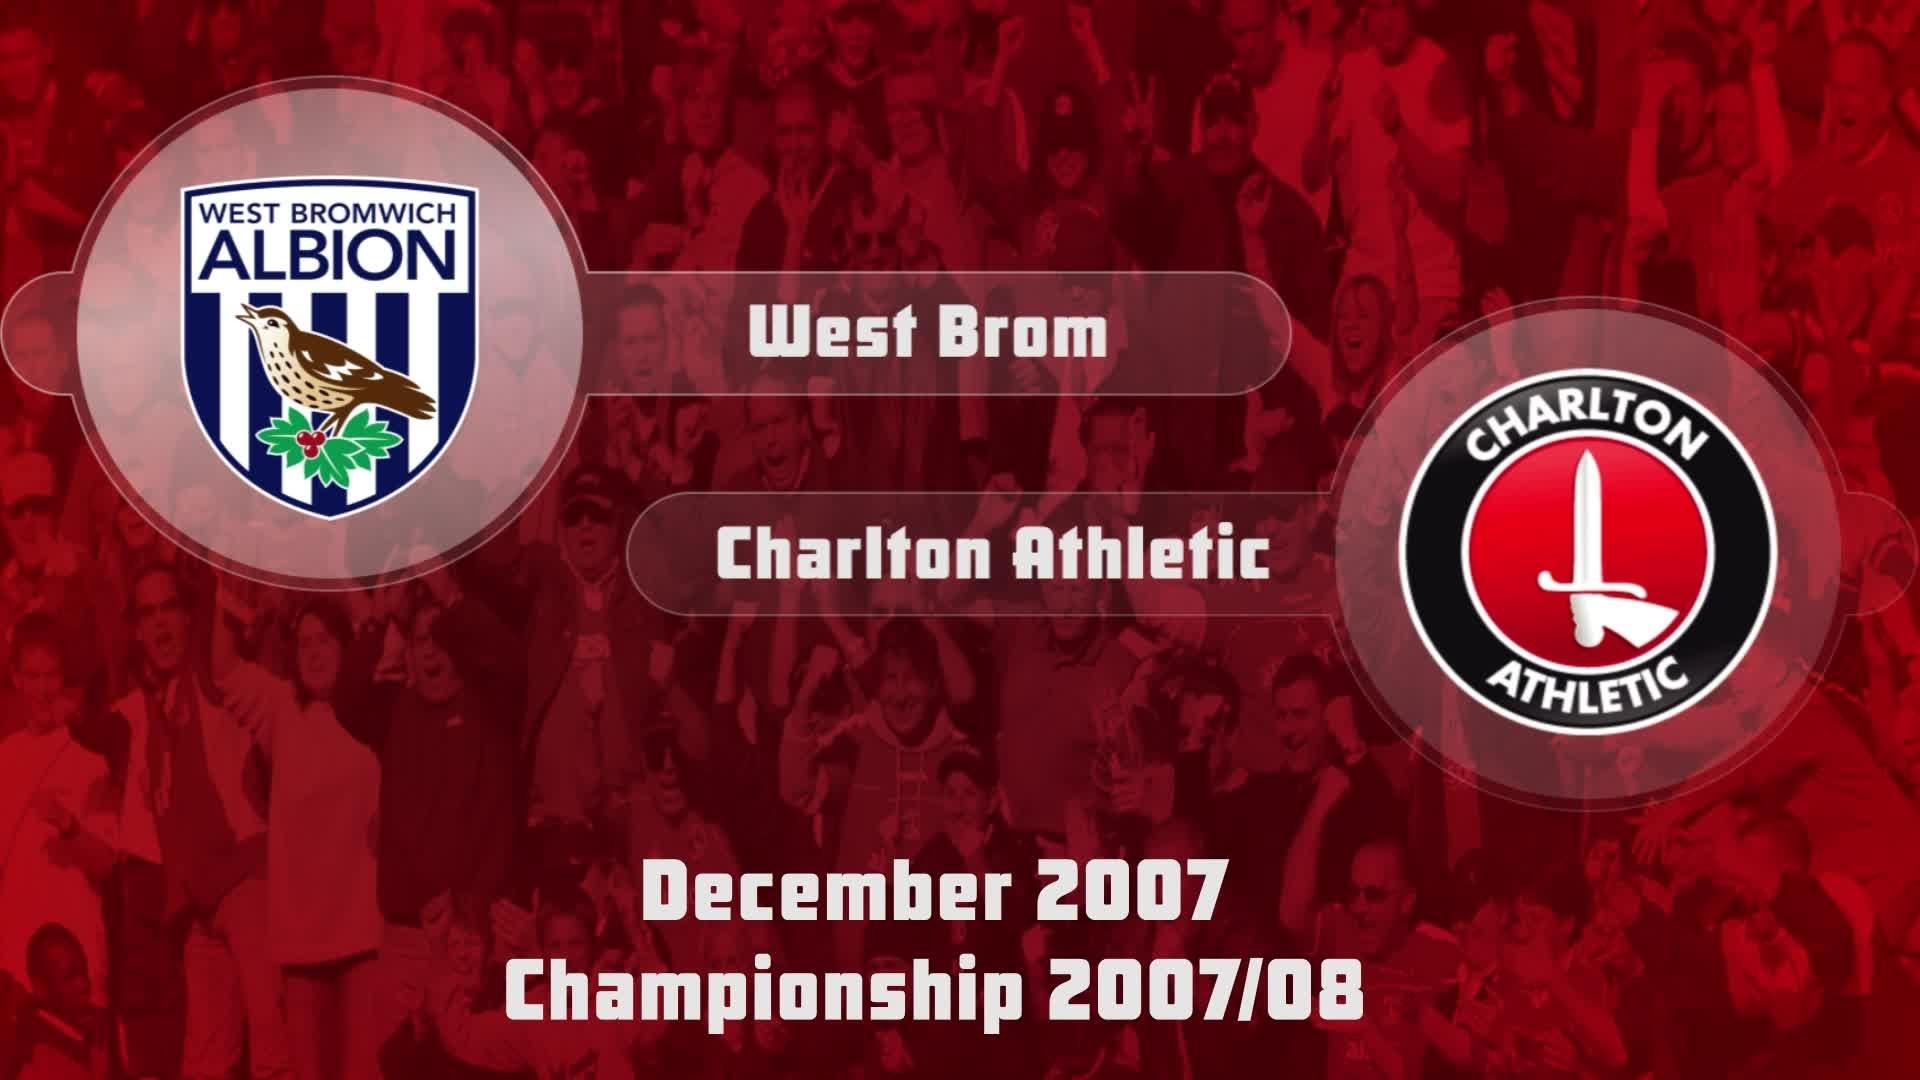 25 HIGHLIGHTS | West Brom 4 Charlton 2 (Dec 2007)